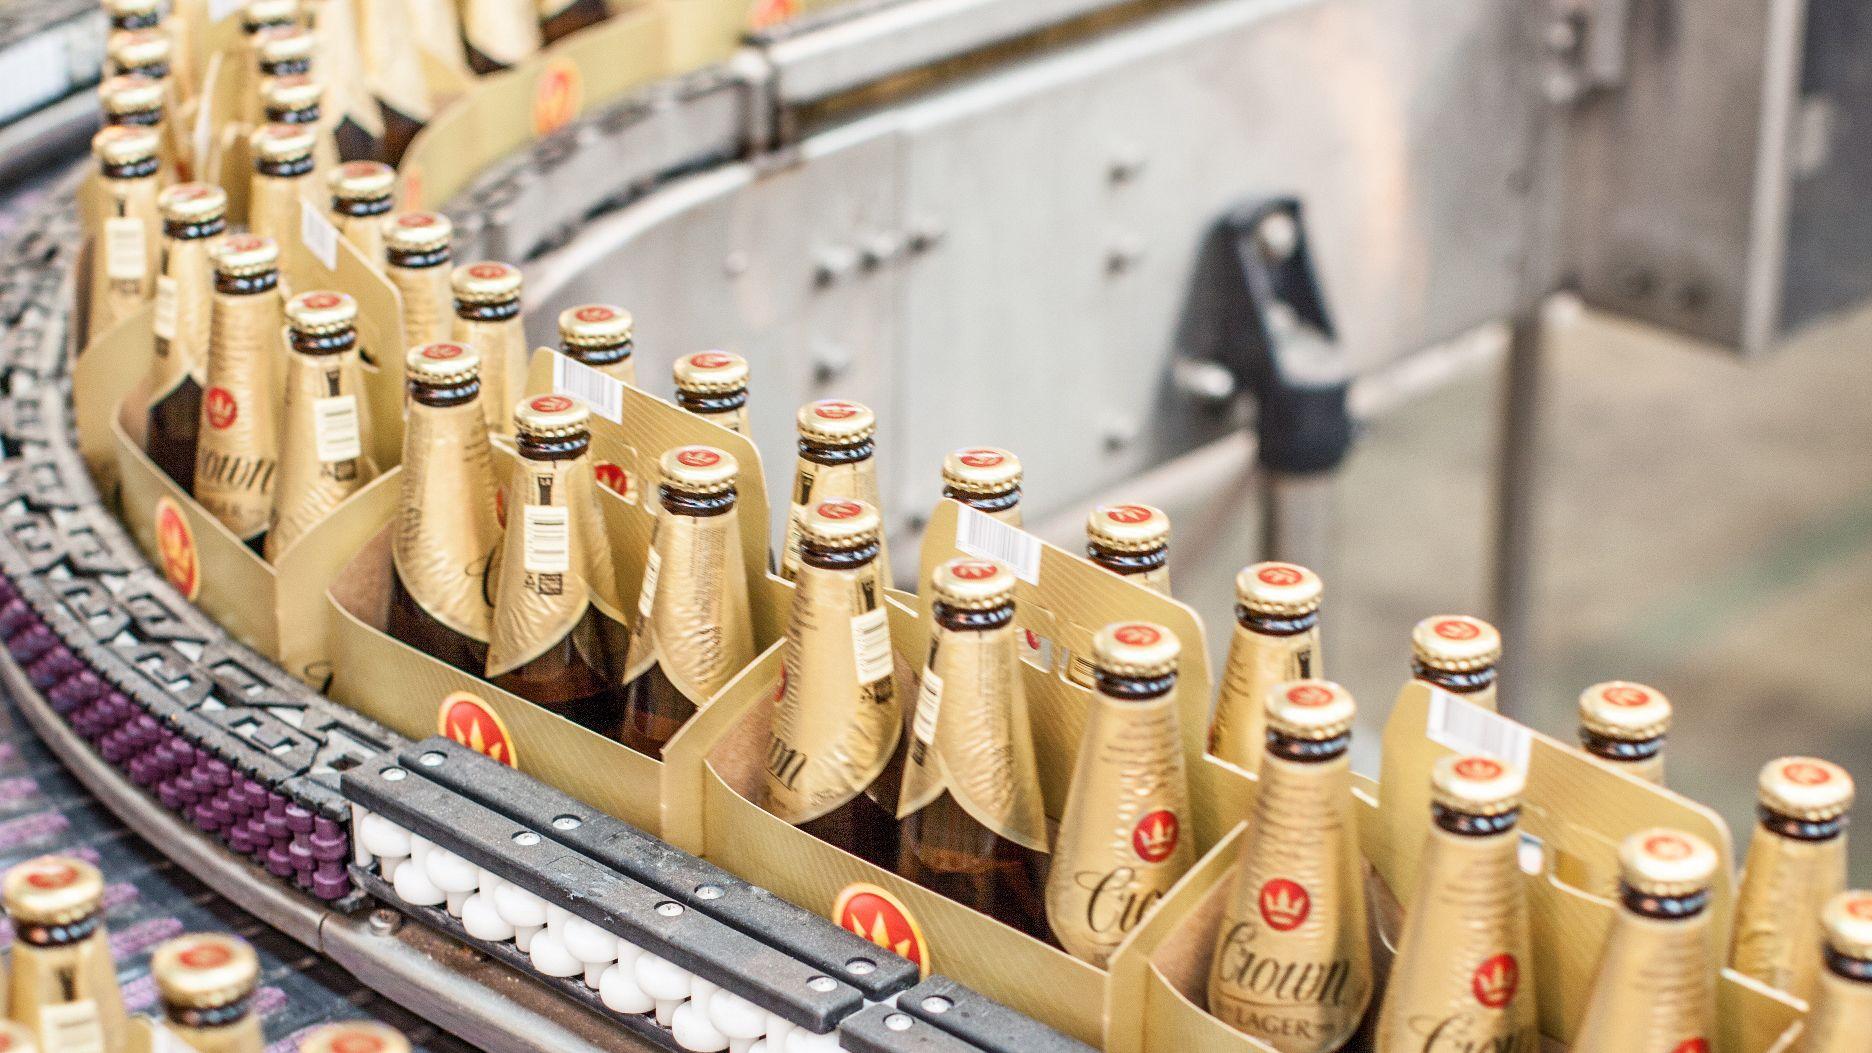 long neck beer bottles move along conveyor belt in brewery in Melbourne